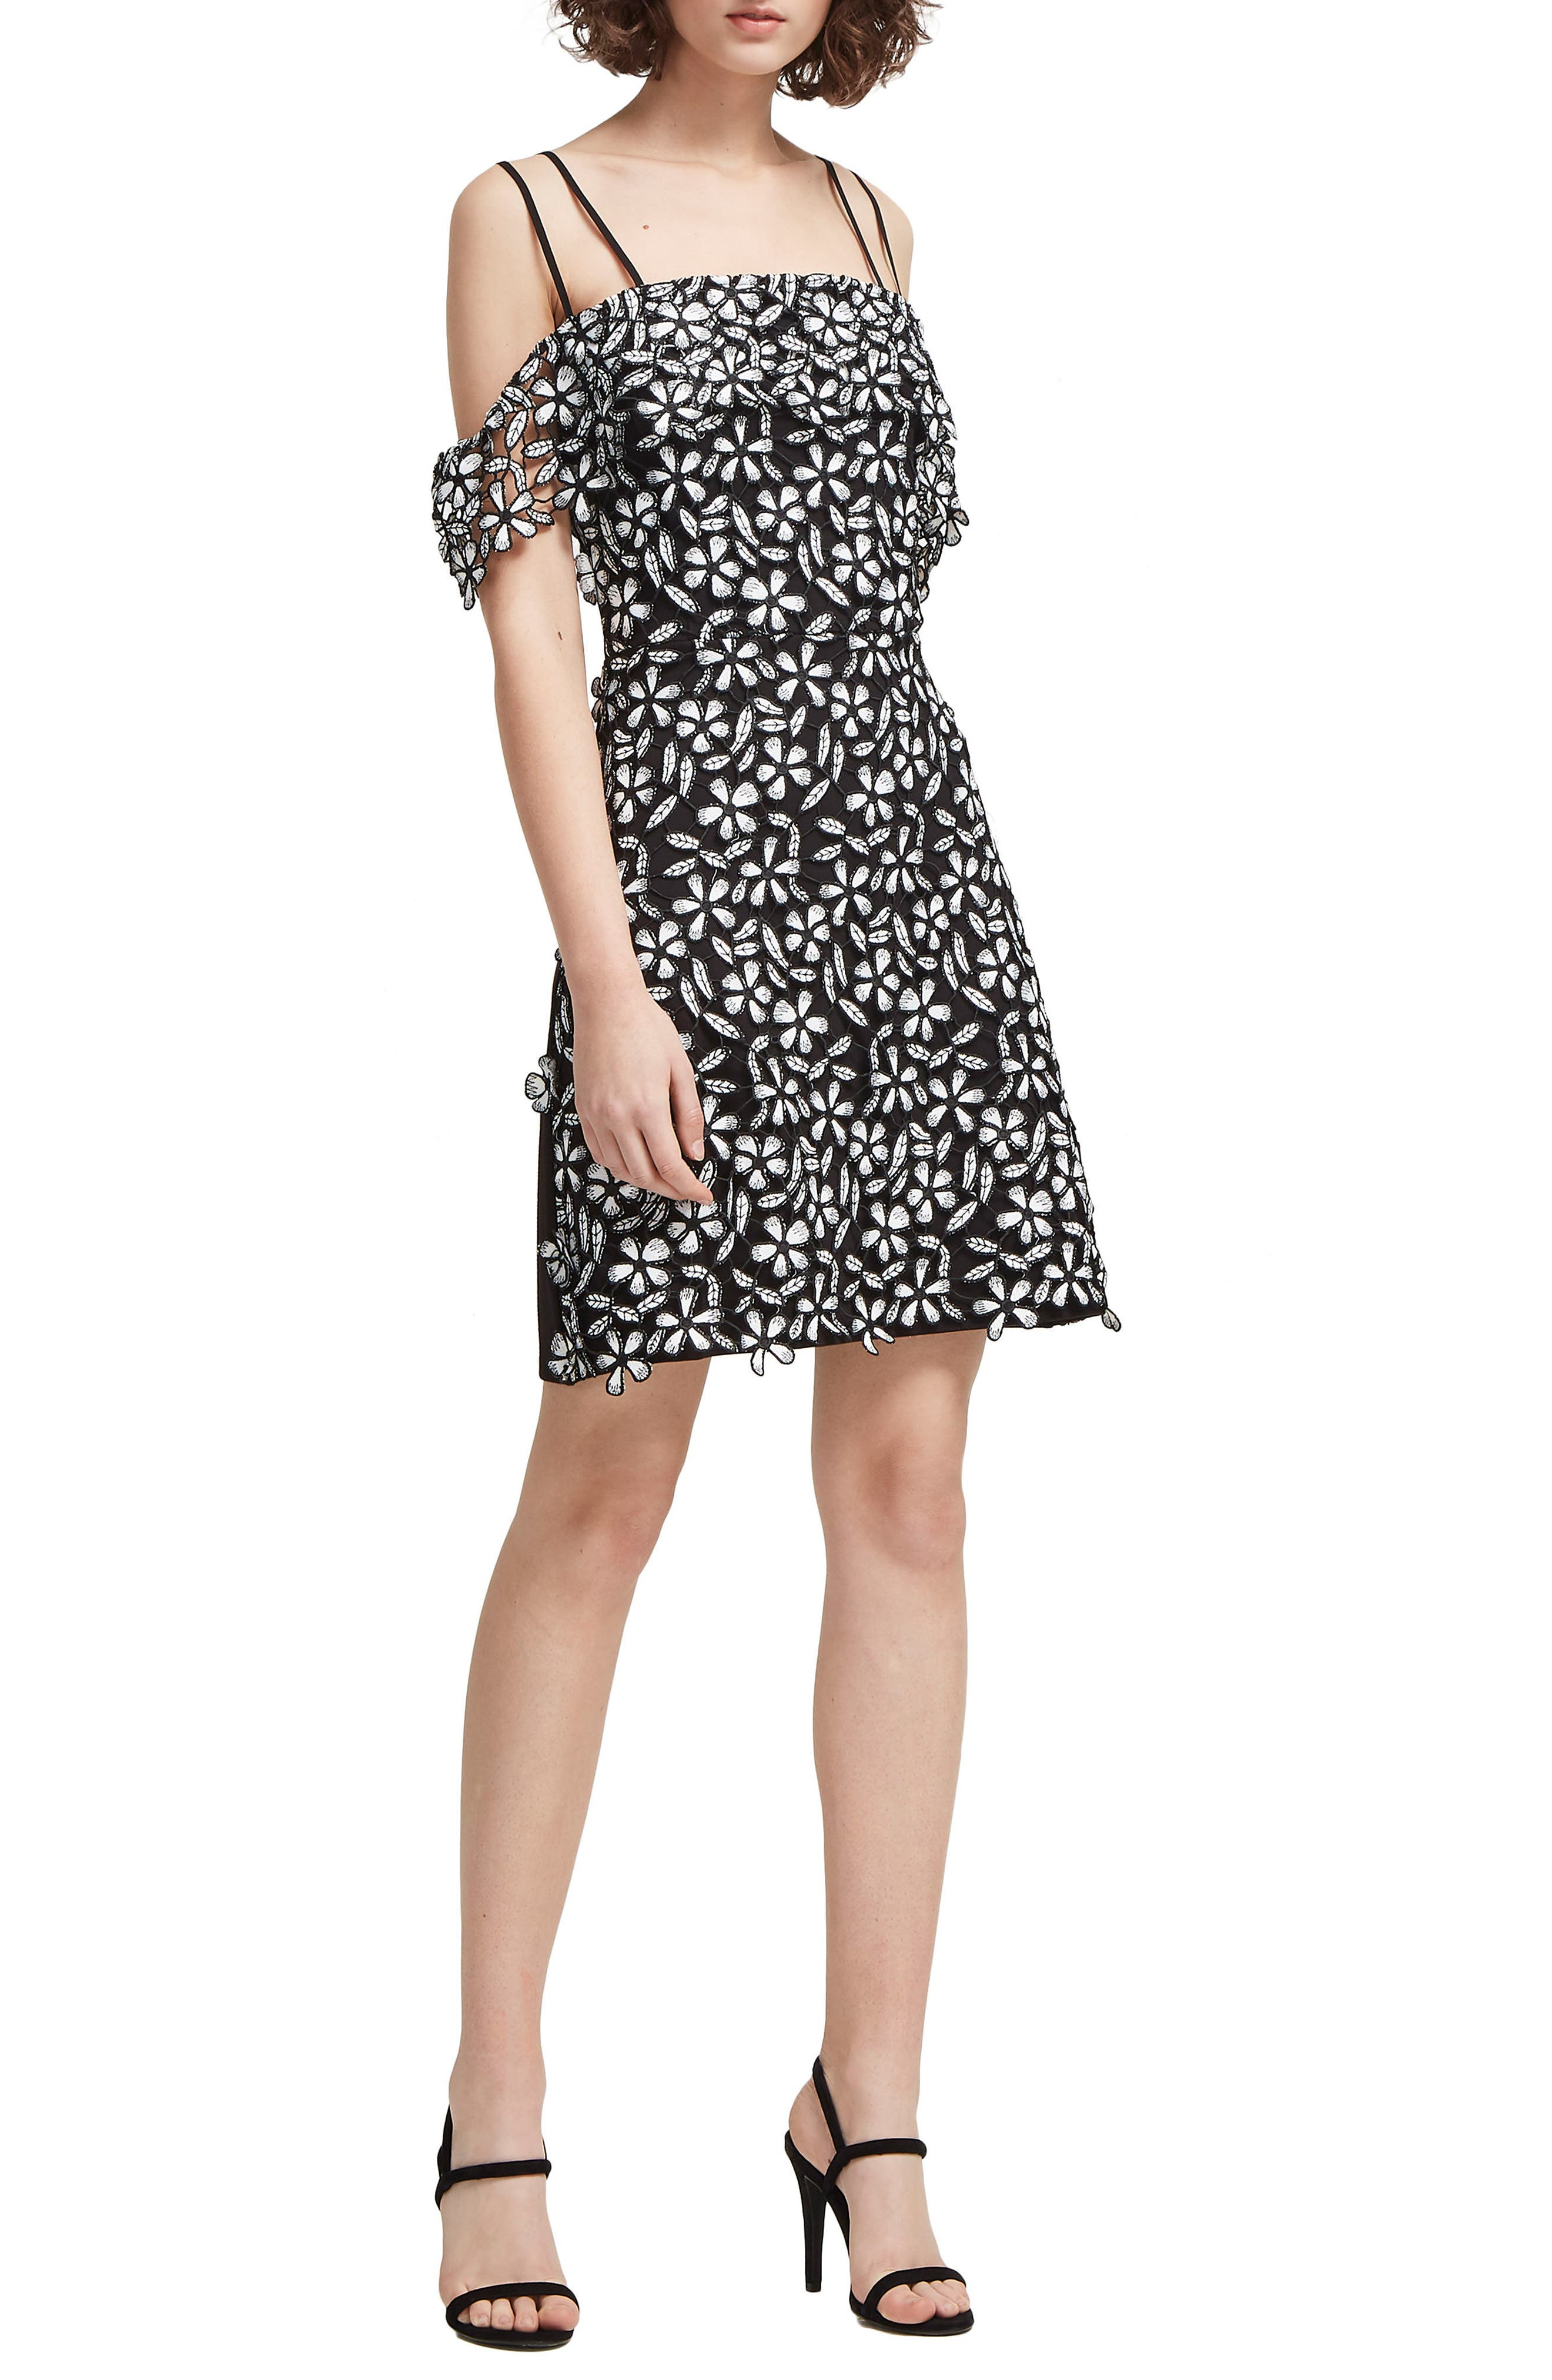 Fulaga Floral Lace Cold Shoulder Dress,                         Main,                         color, 001